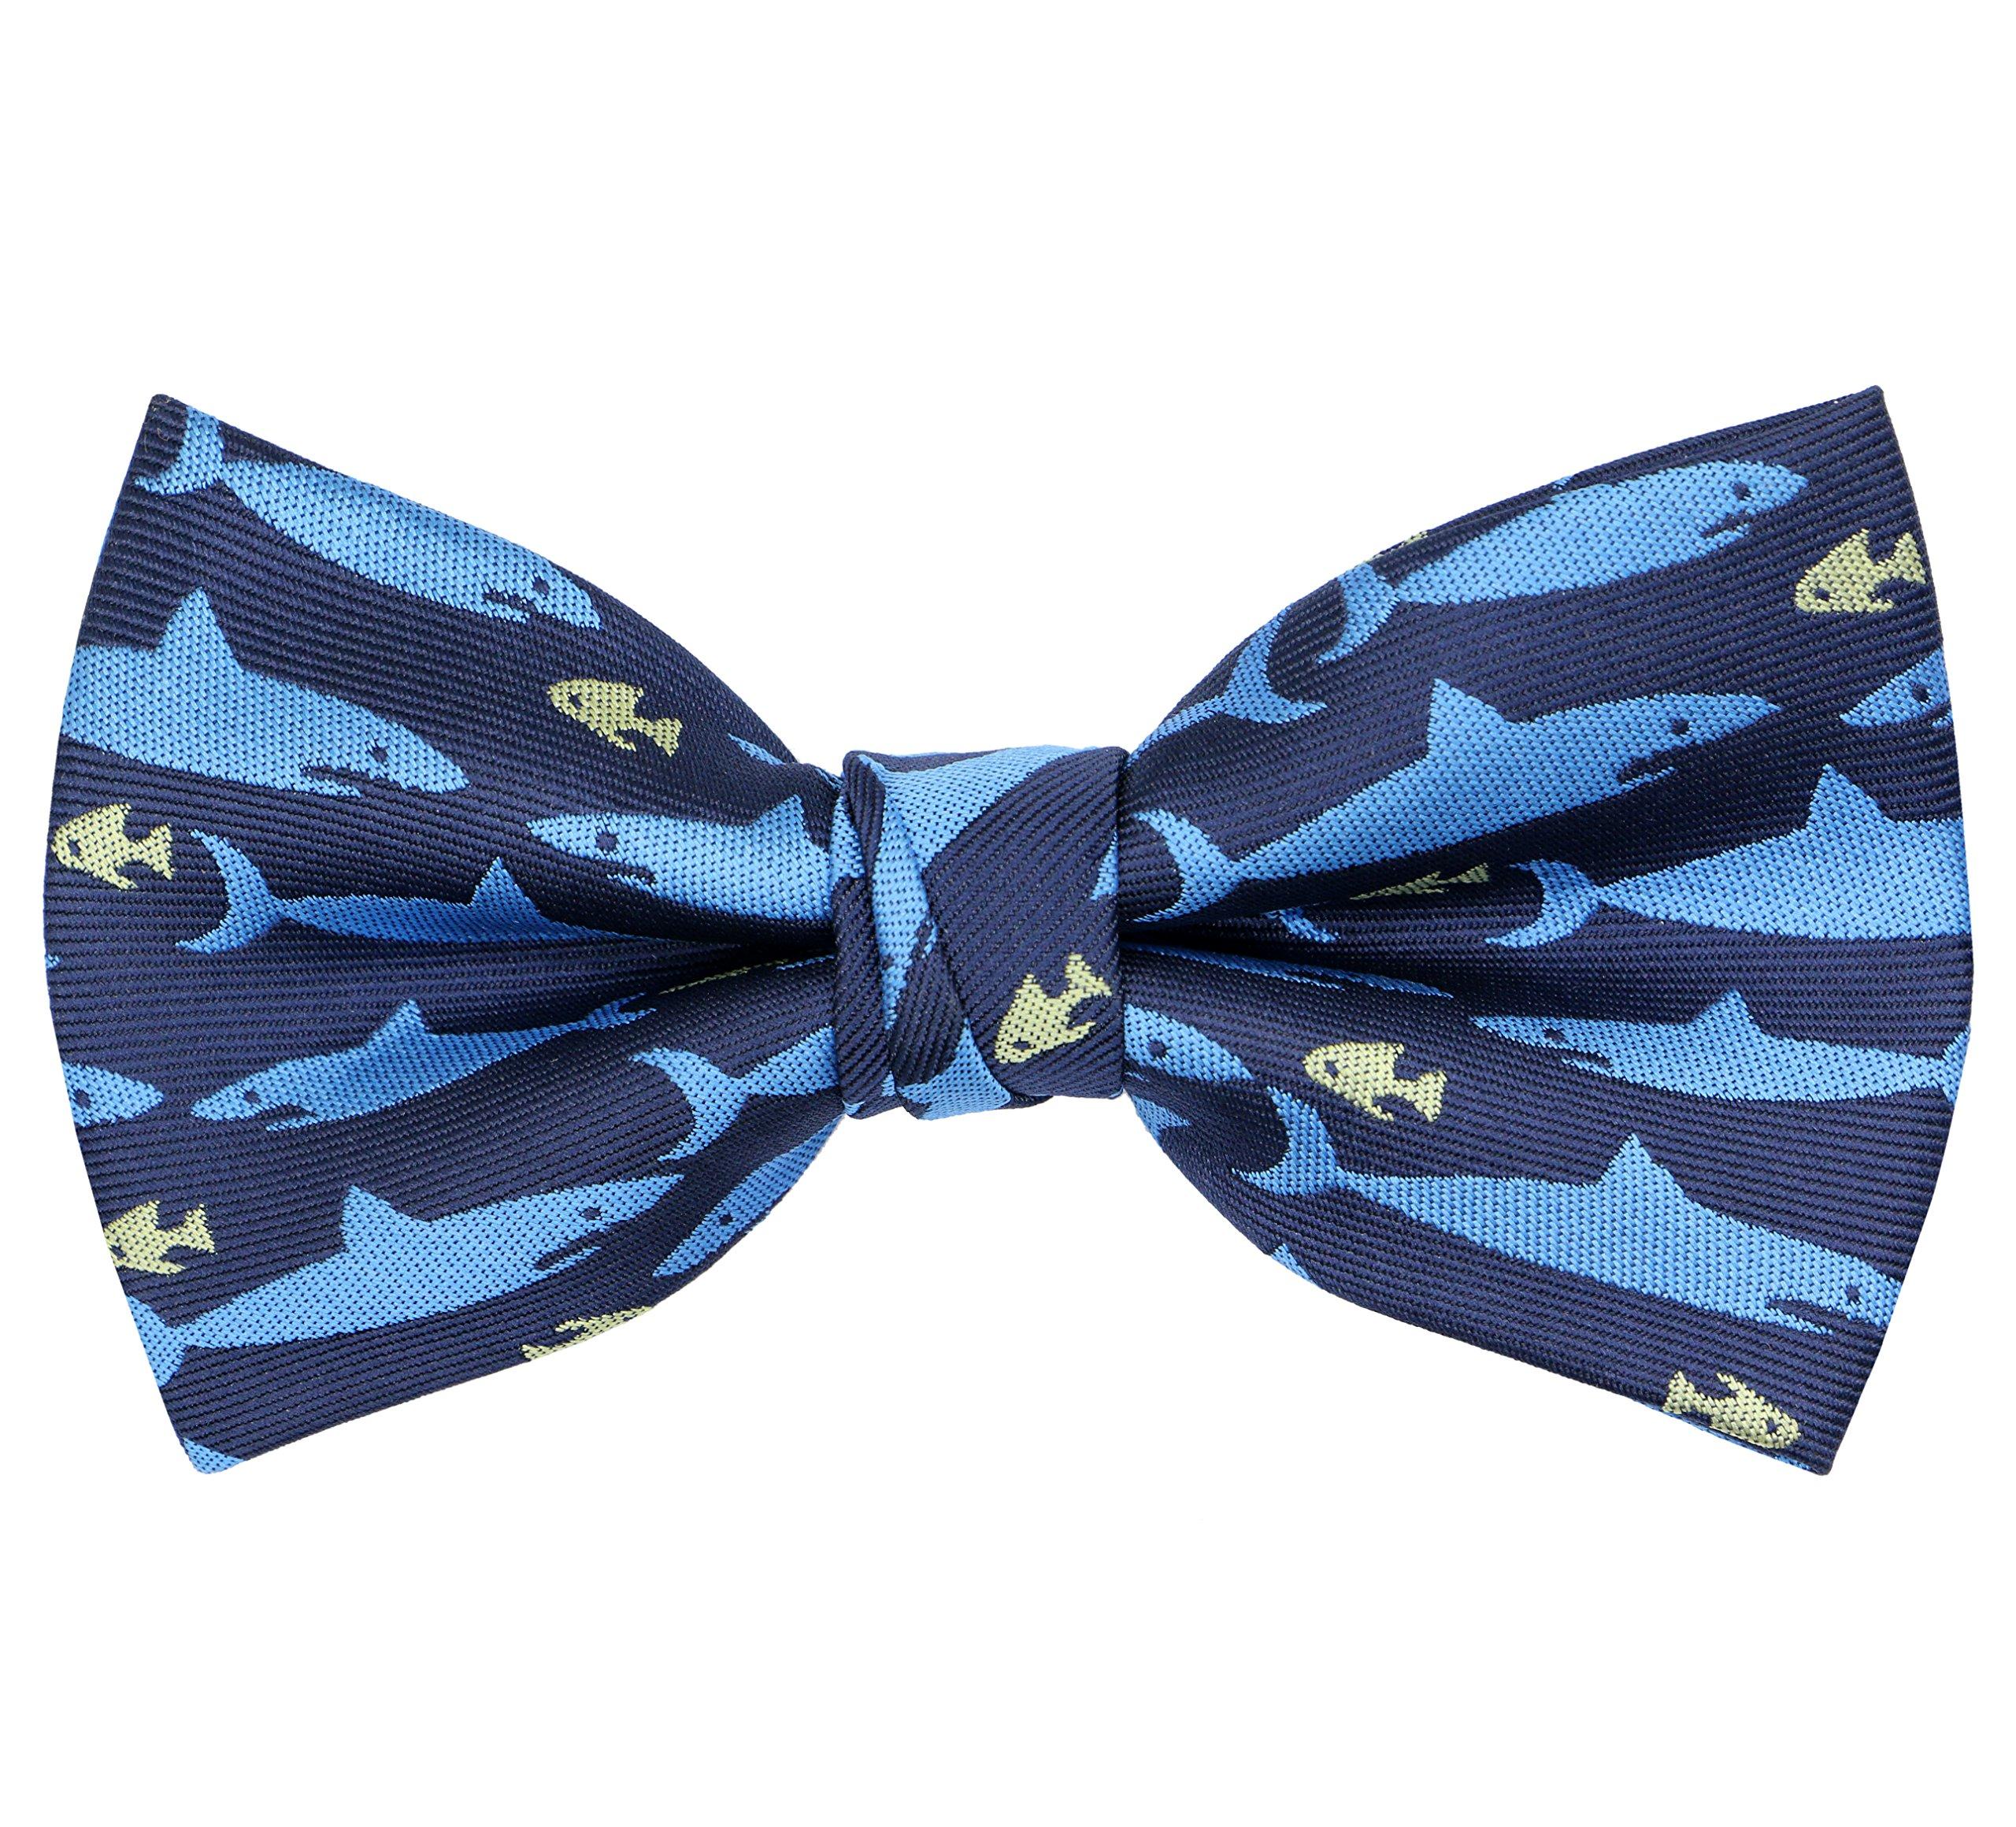 OCIA Pre-Tied Bow Tie Pattern Adjustable Bowties Blue Shark